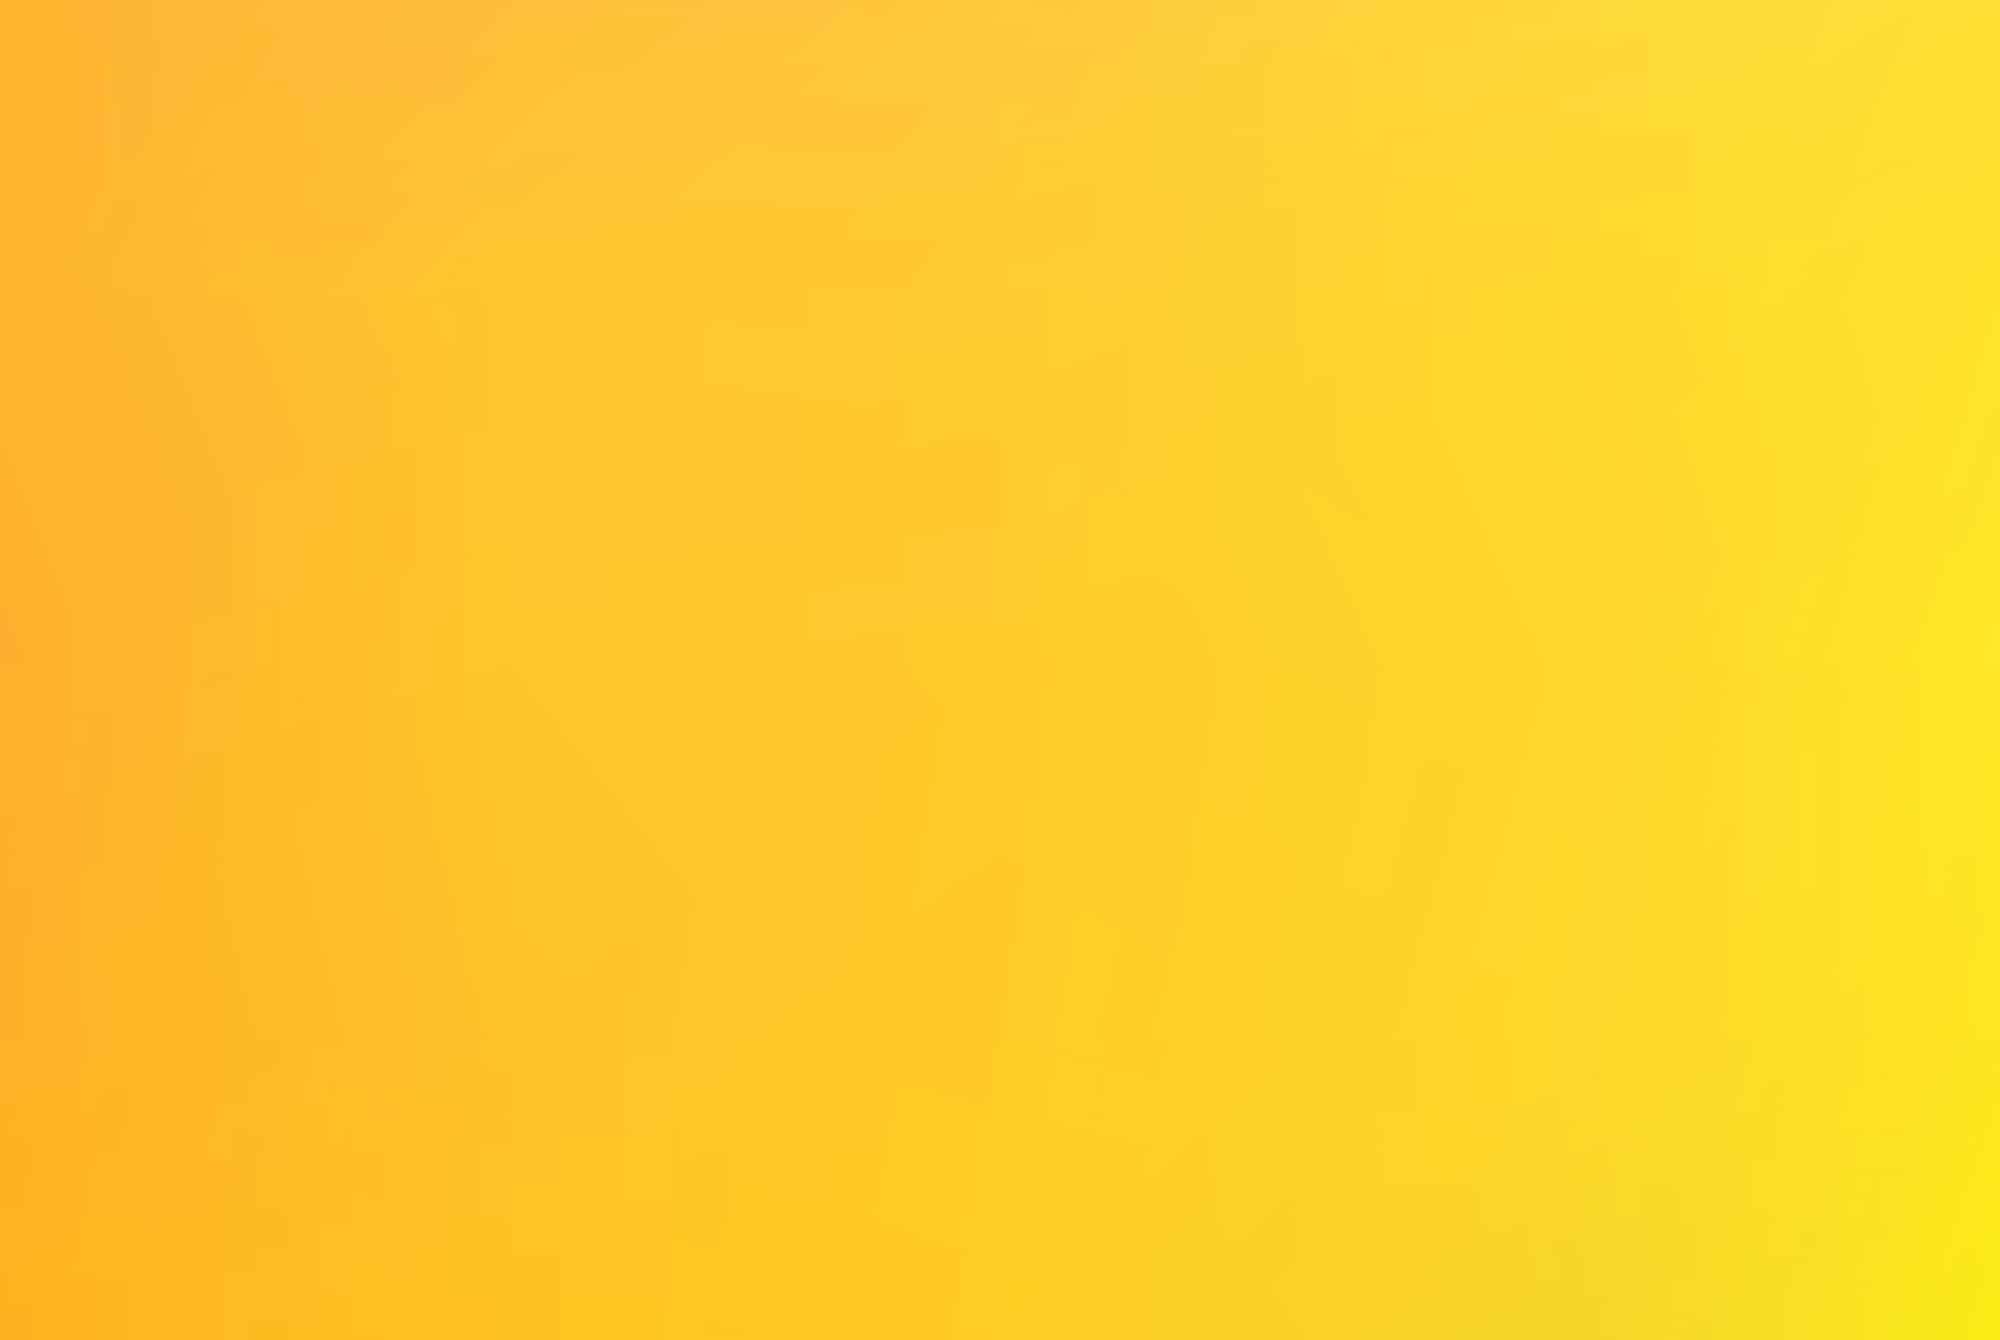 african emojis background